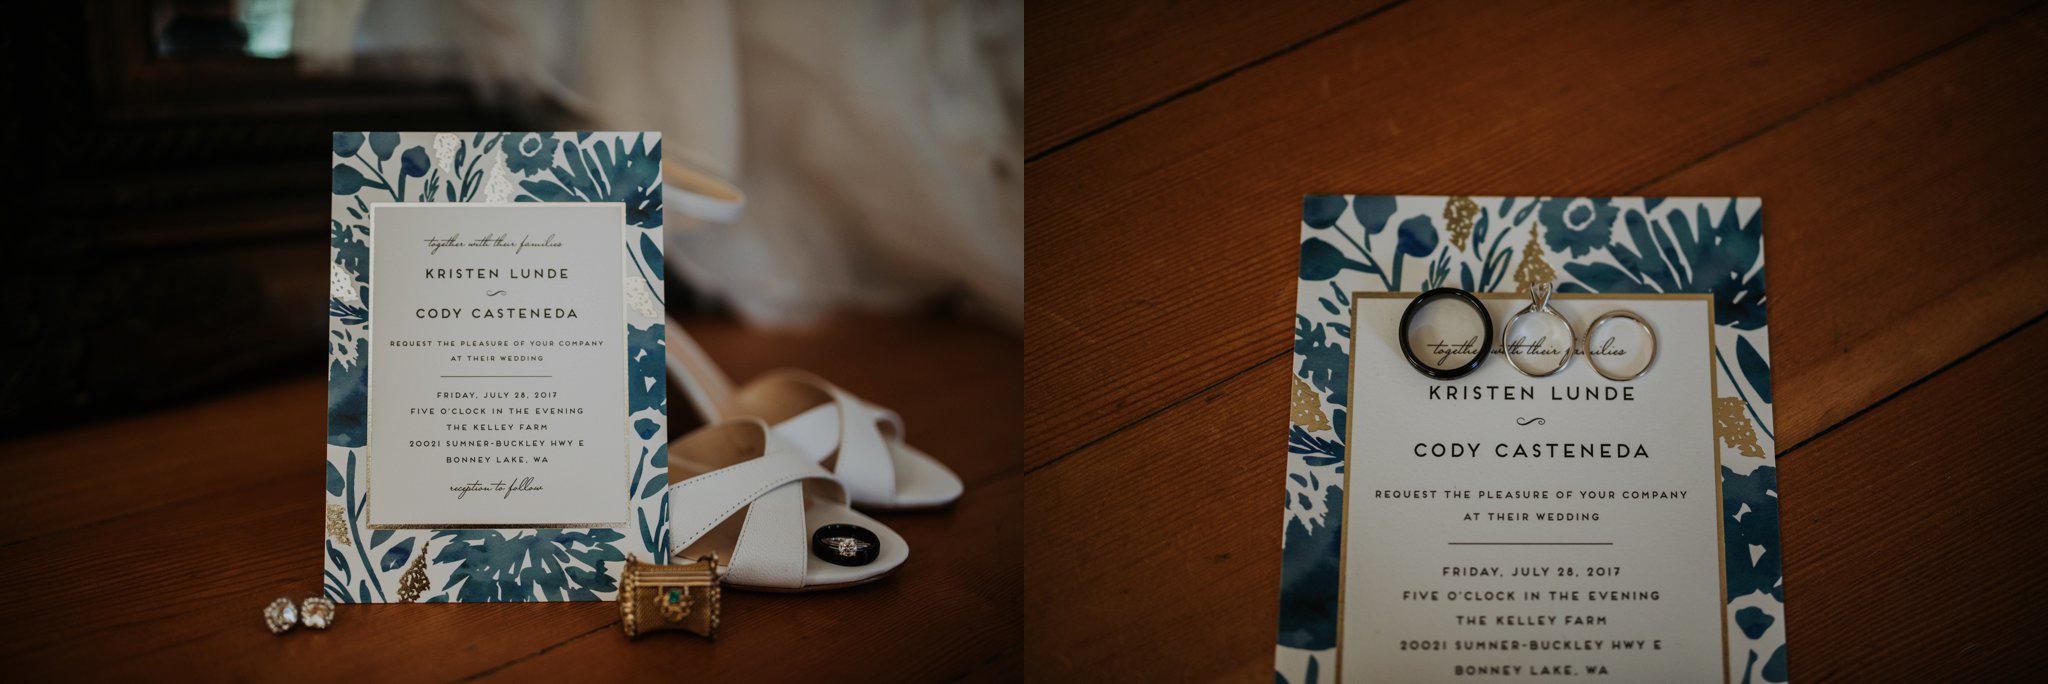 kristen-and-cody-the-kelley-farm-wedding-seattle-photographer-caitlyn-nikula-5.jpg